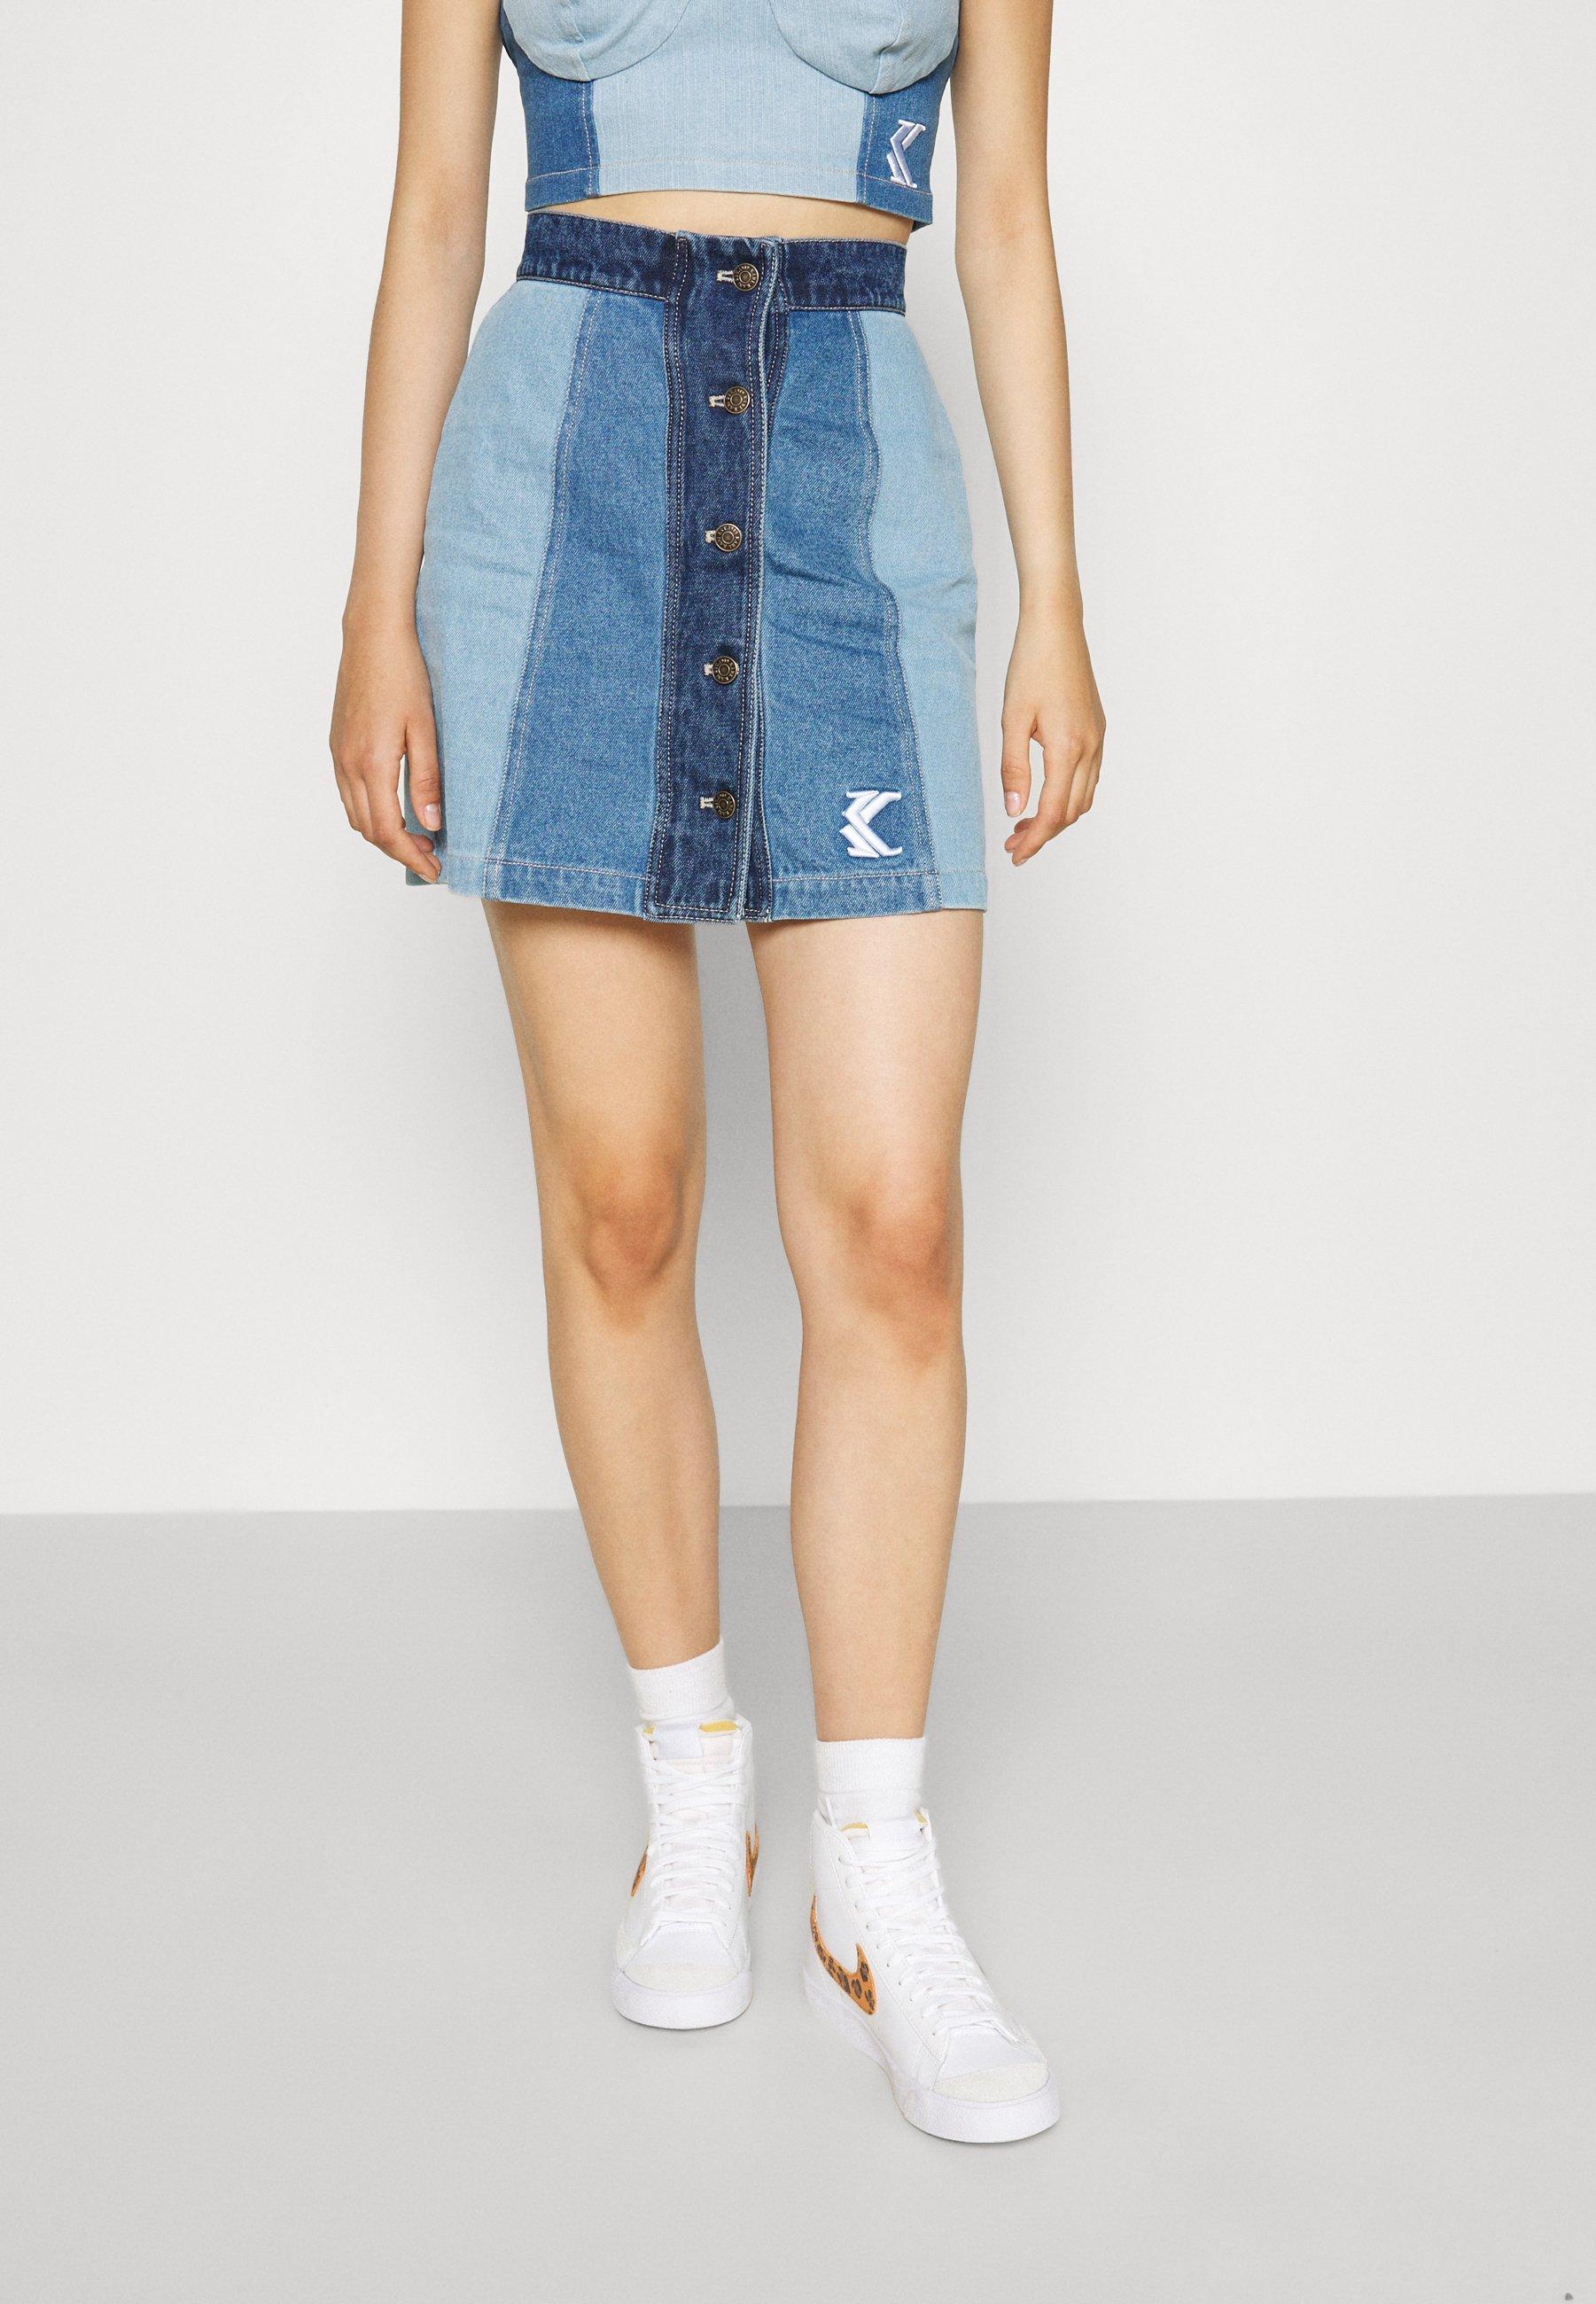 Femme BLOCK SKIRT - Minijupe